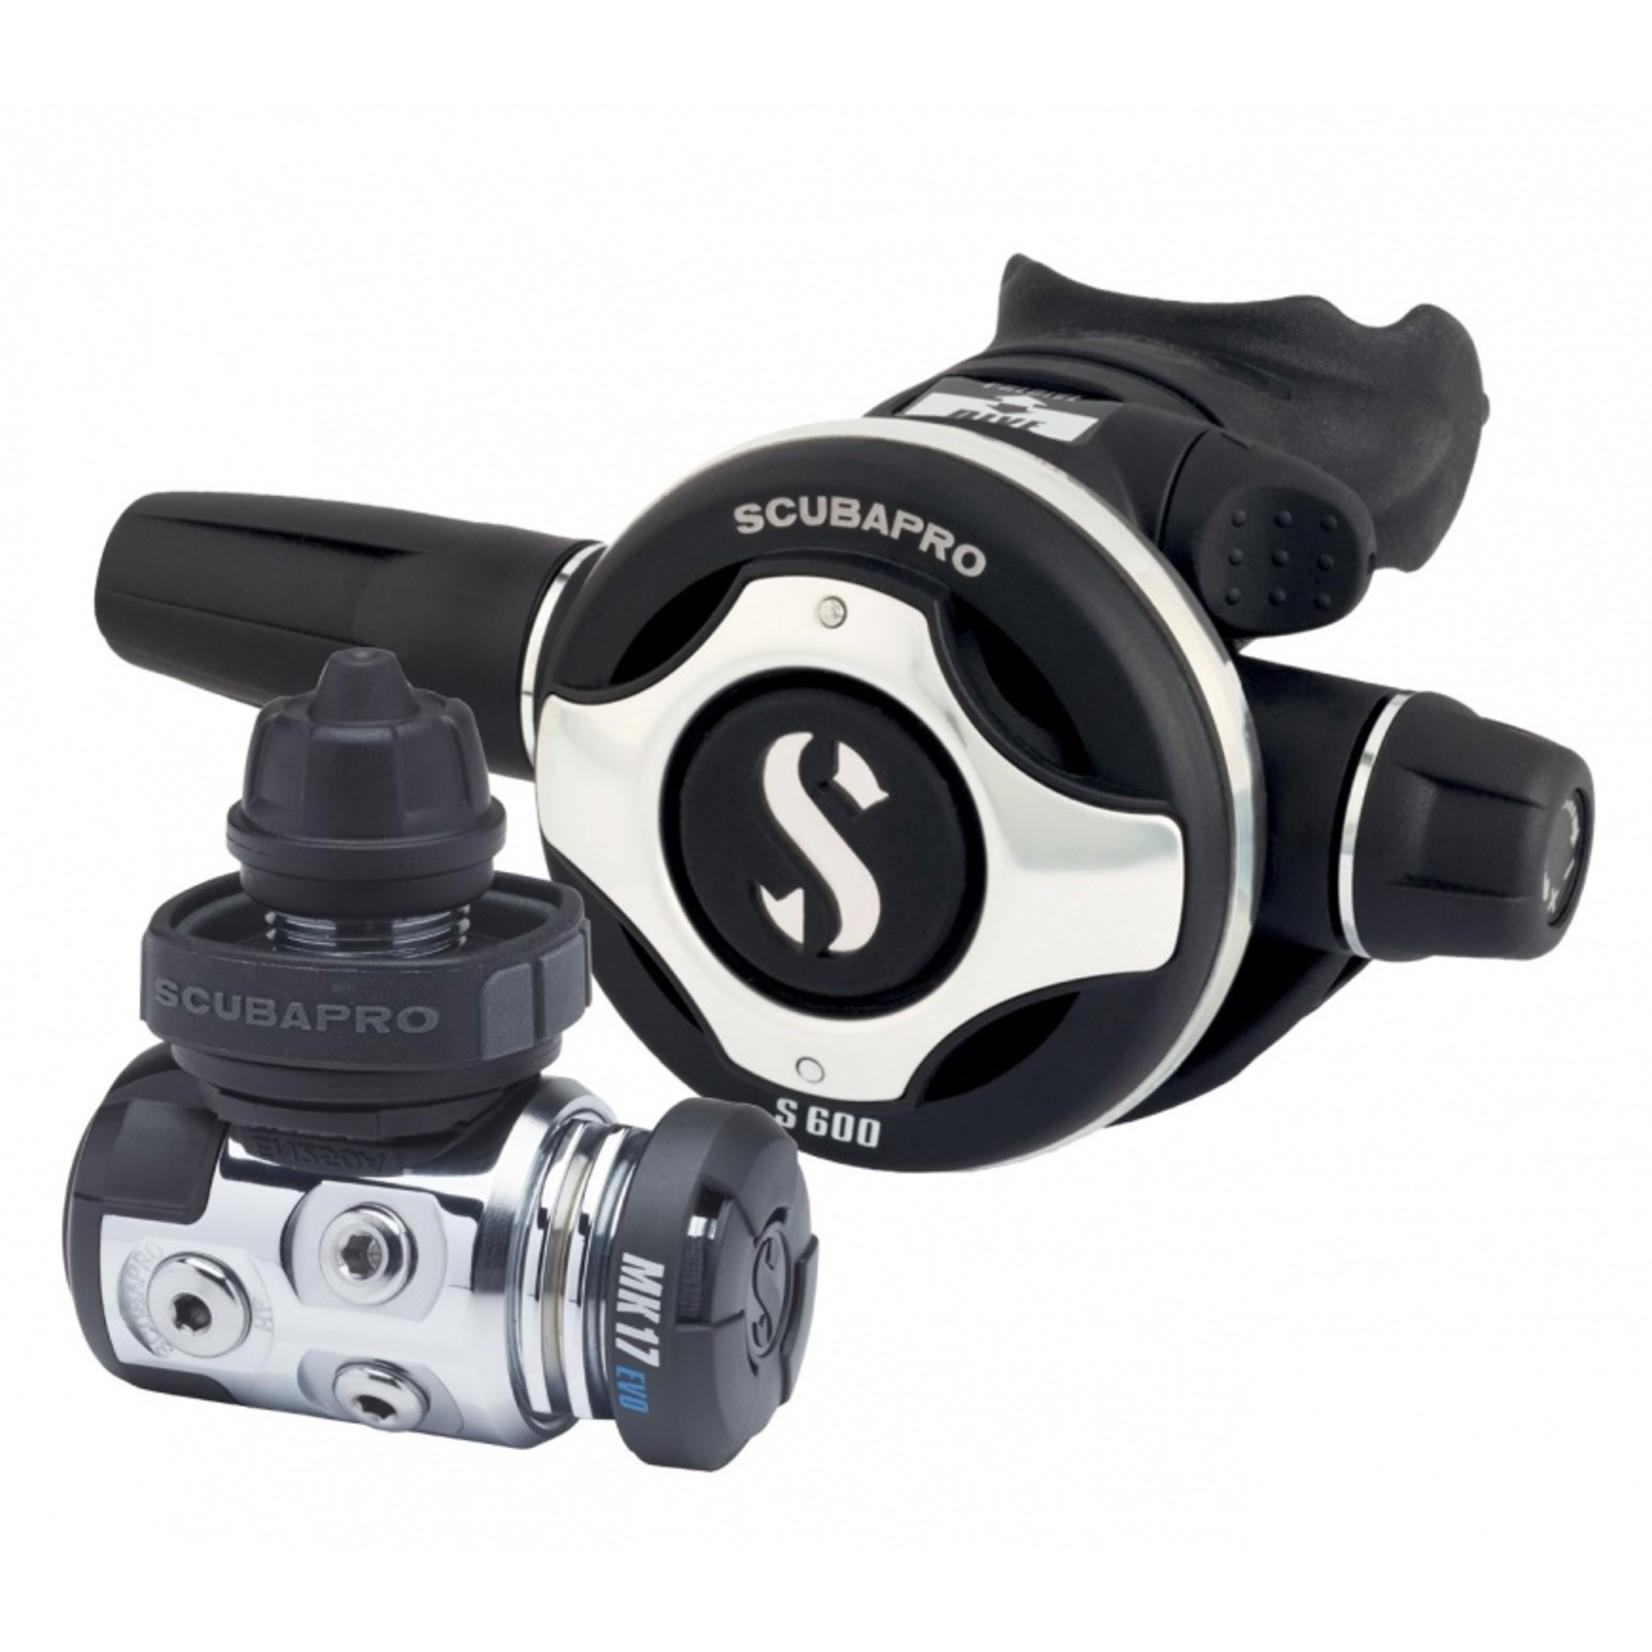 Scubapro MK17 EVO / S600 set